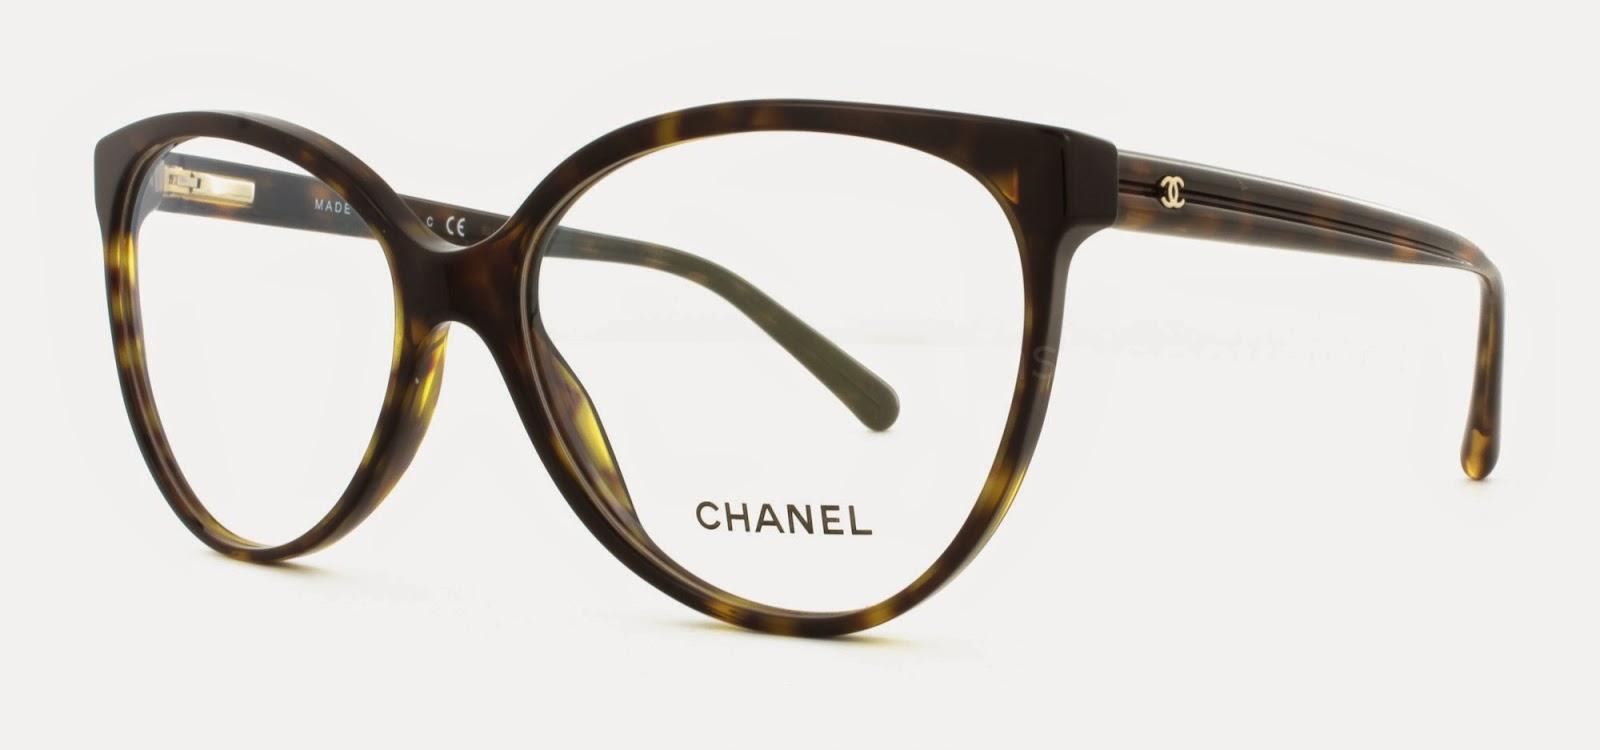 2f743373be06e Óculos graduados Chanel - A Miúda dos Saltos Altos